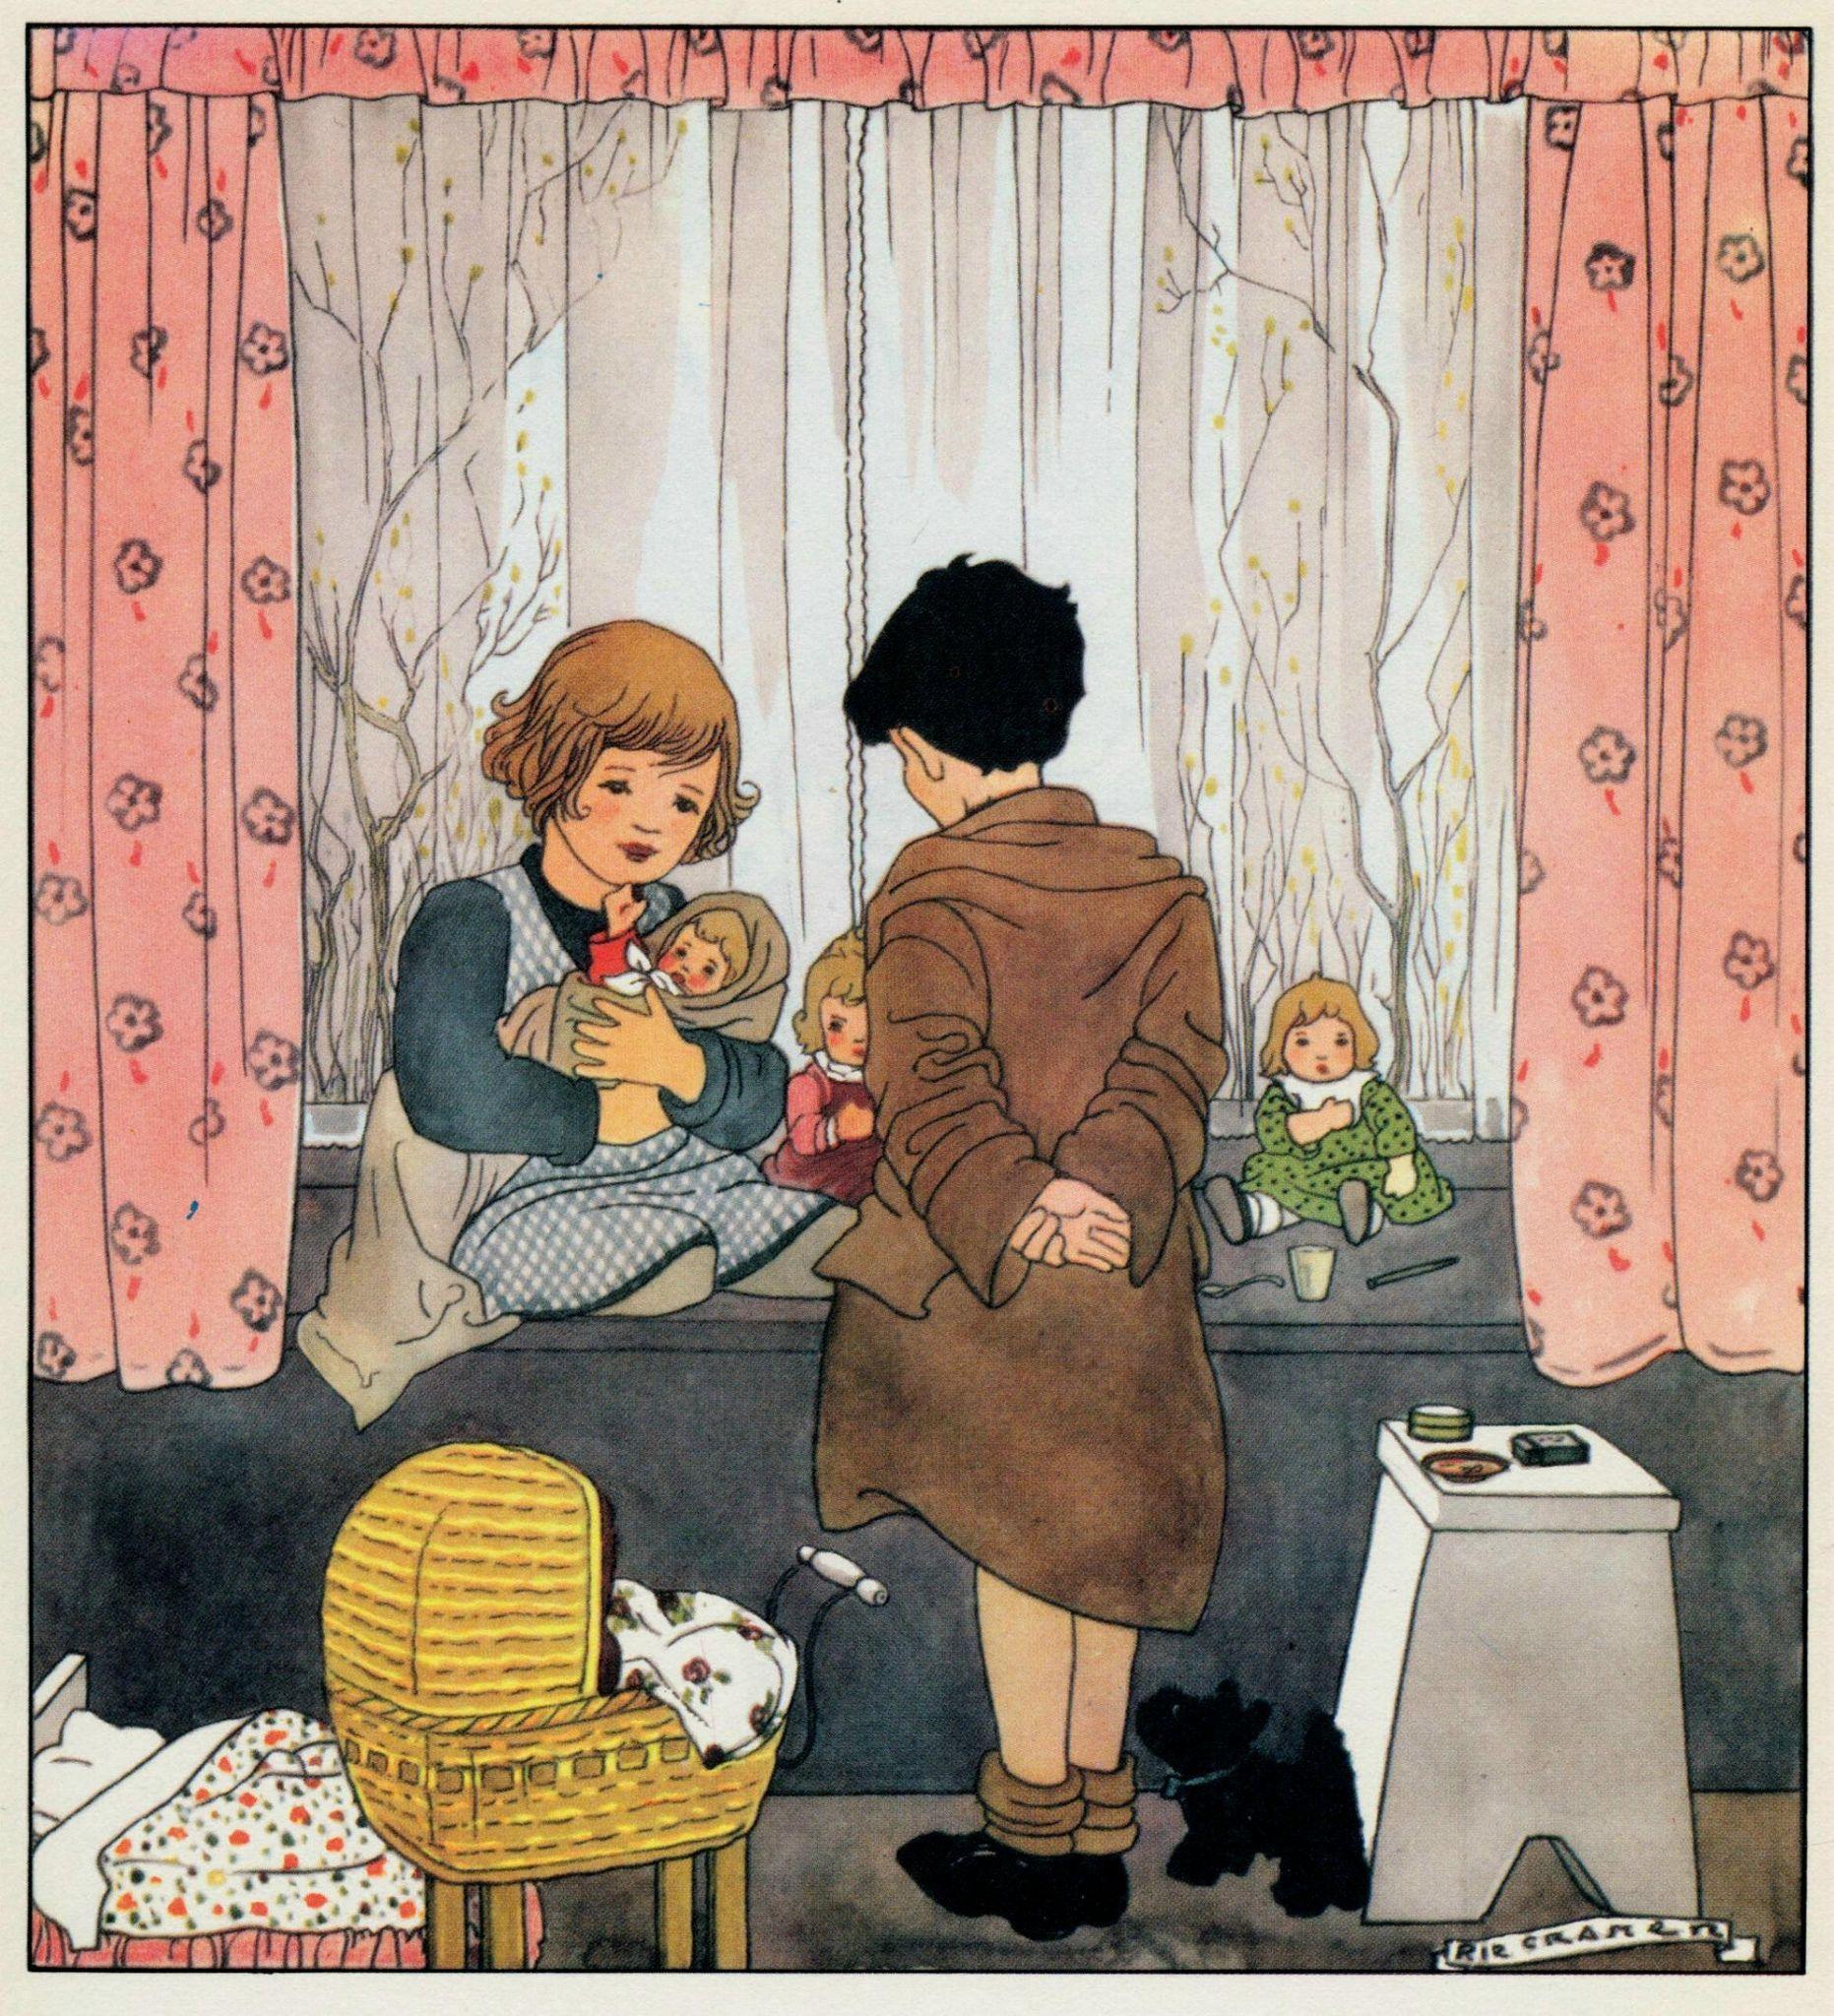 Rie Cramer Het jaar rond editie 1978, ill verkouden poppen bb | by janwillemsen